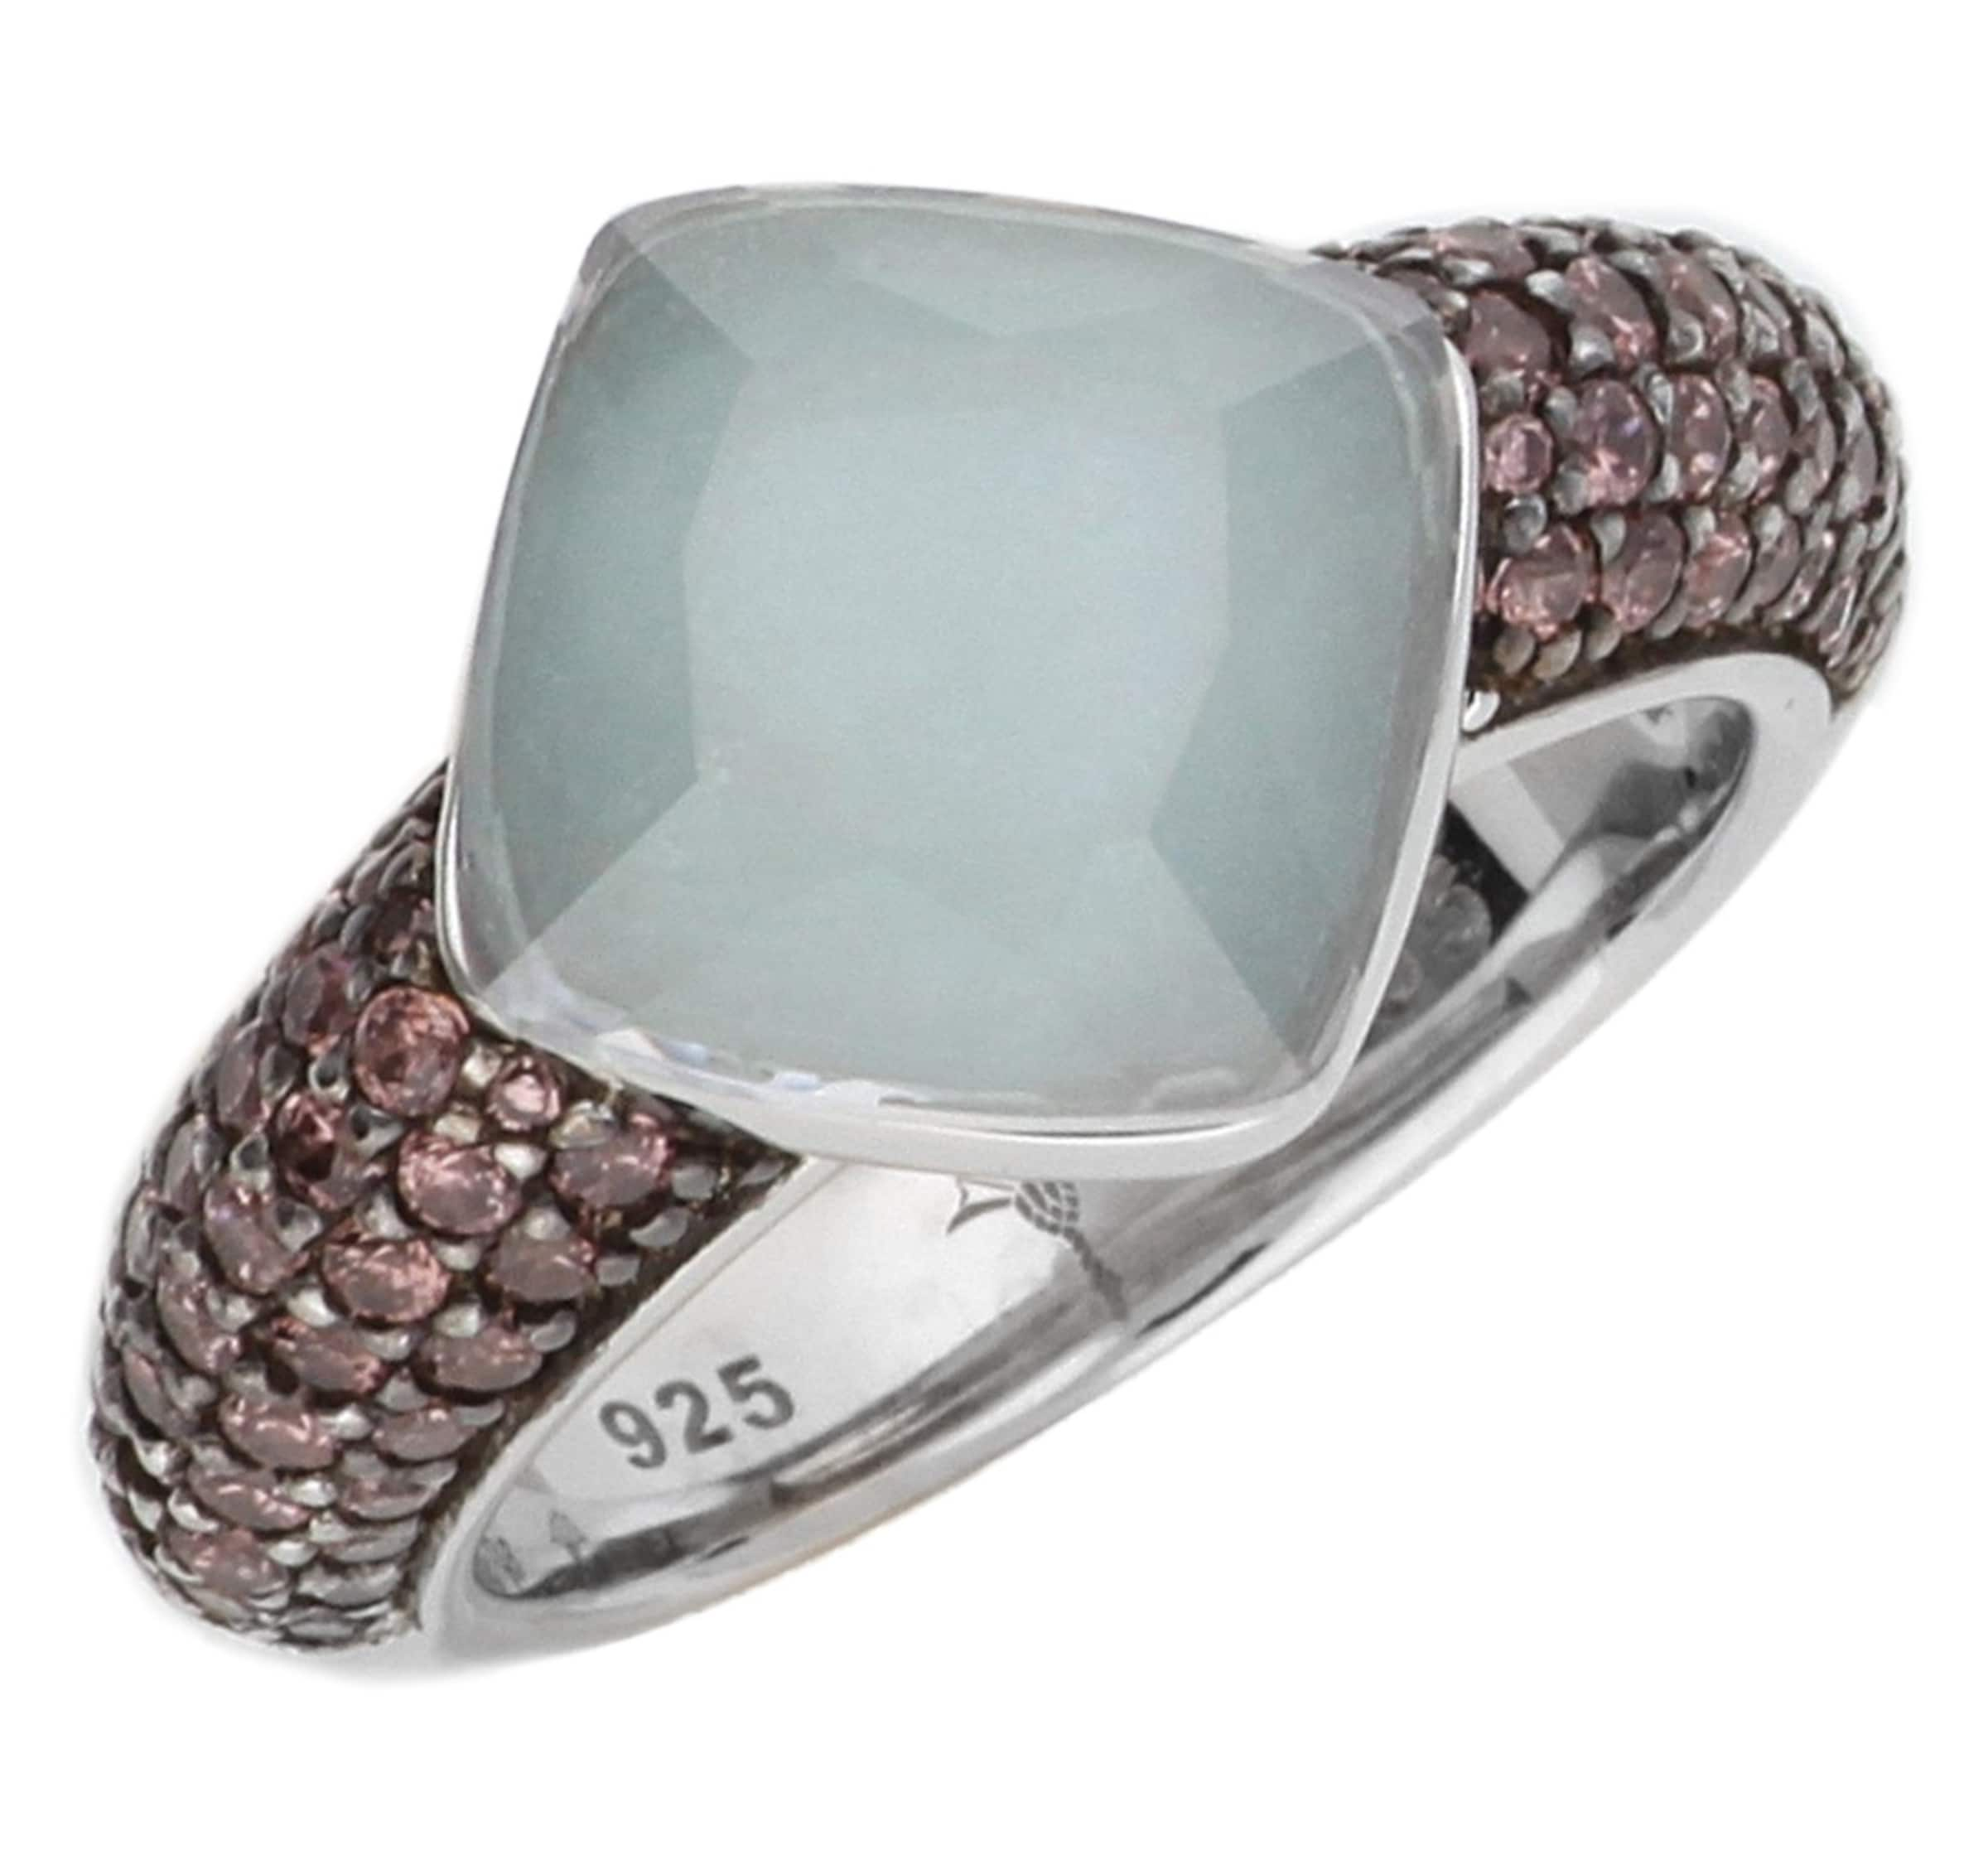 Auslass Extrem JOOP! Fingerring Silber Türkis Kirsten JPRG90657A Schnelle Lieferung Günstiger Preis 8hTgPW